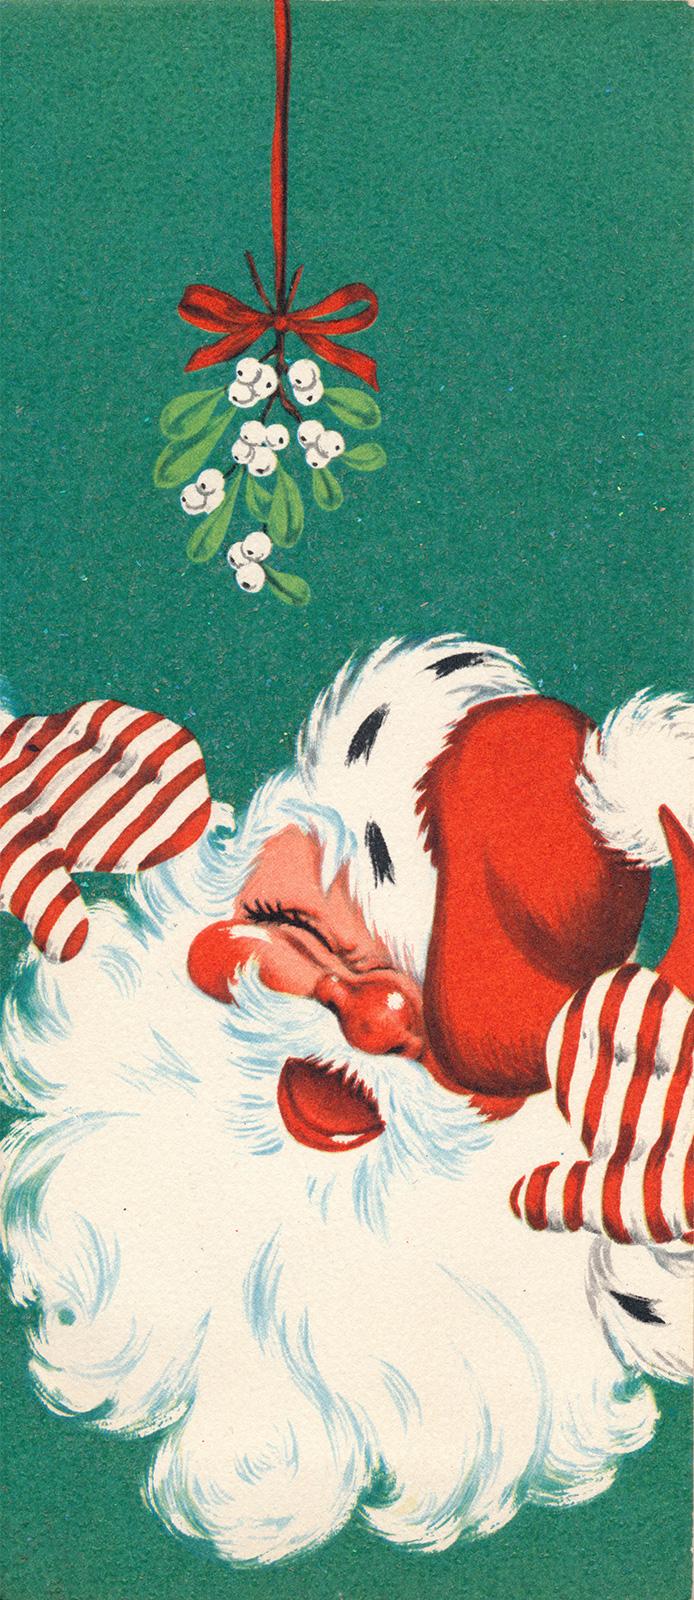 A jolly illustration of Santa is under a hanging mistletoe.